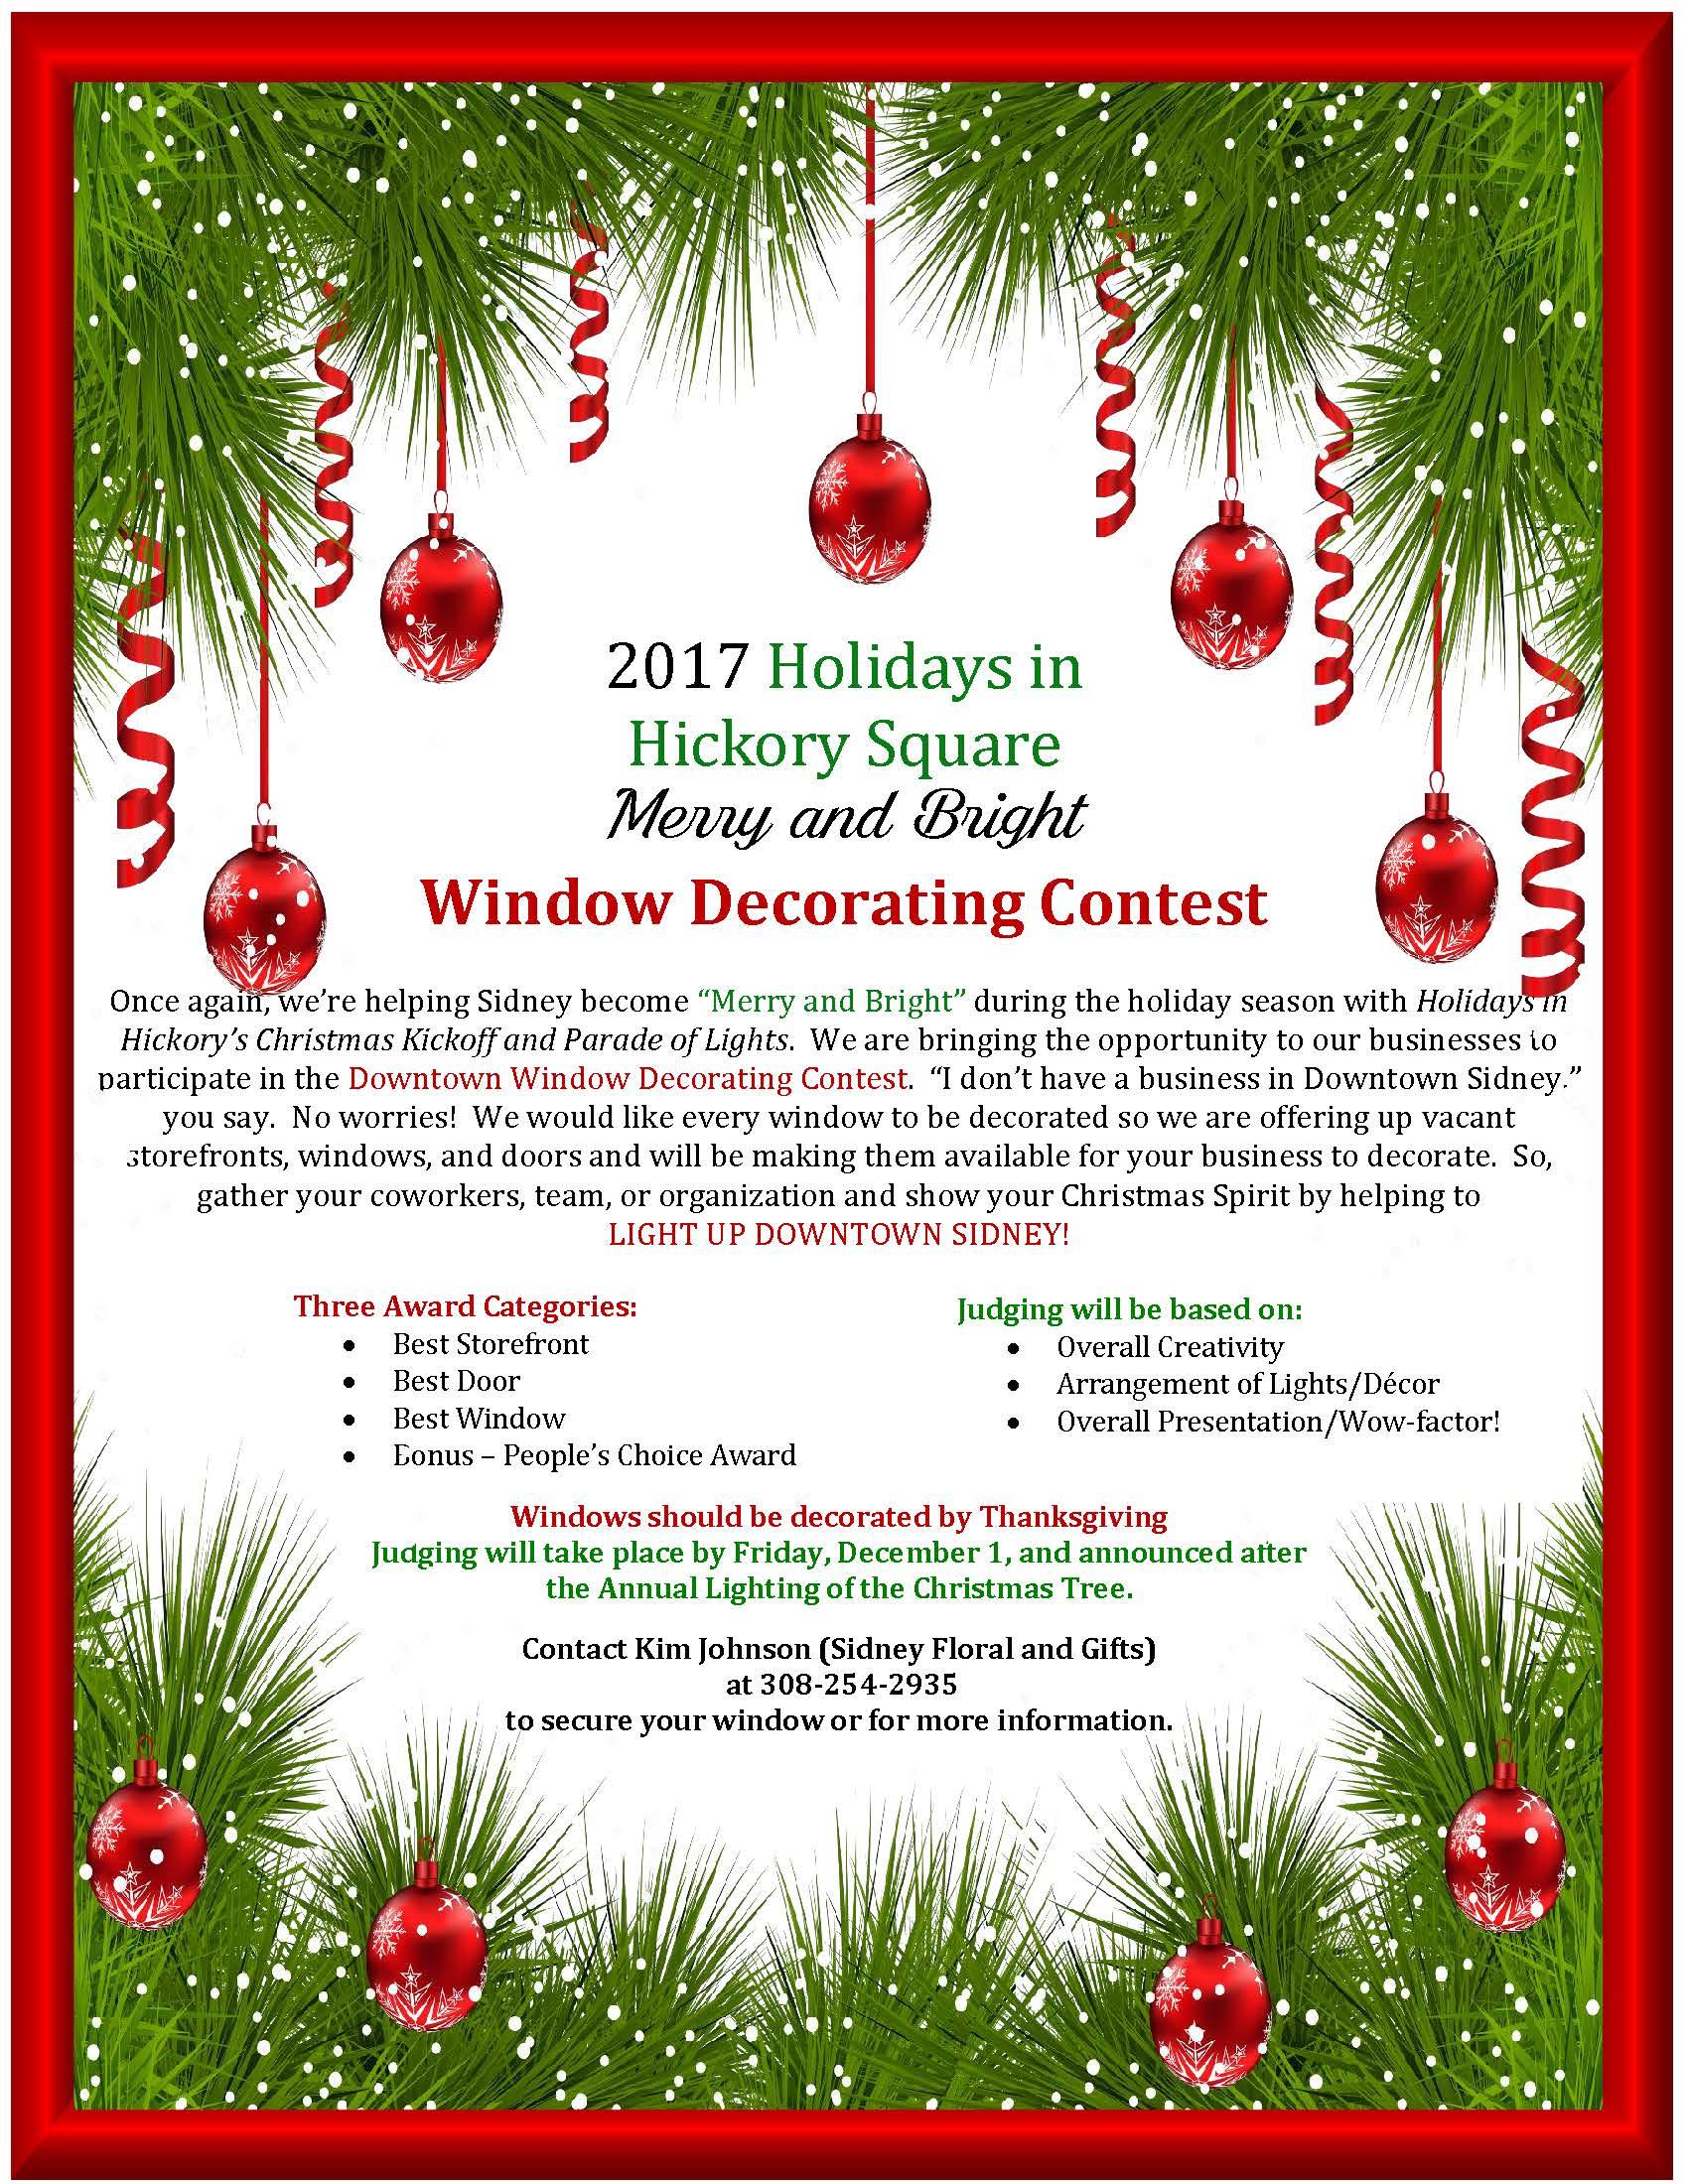 Window-Decorating-Contest-Info-2017_final.jpg